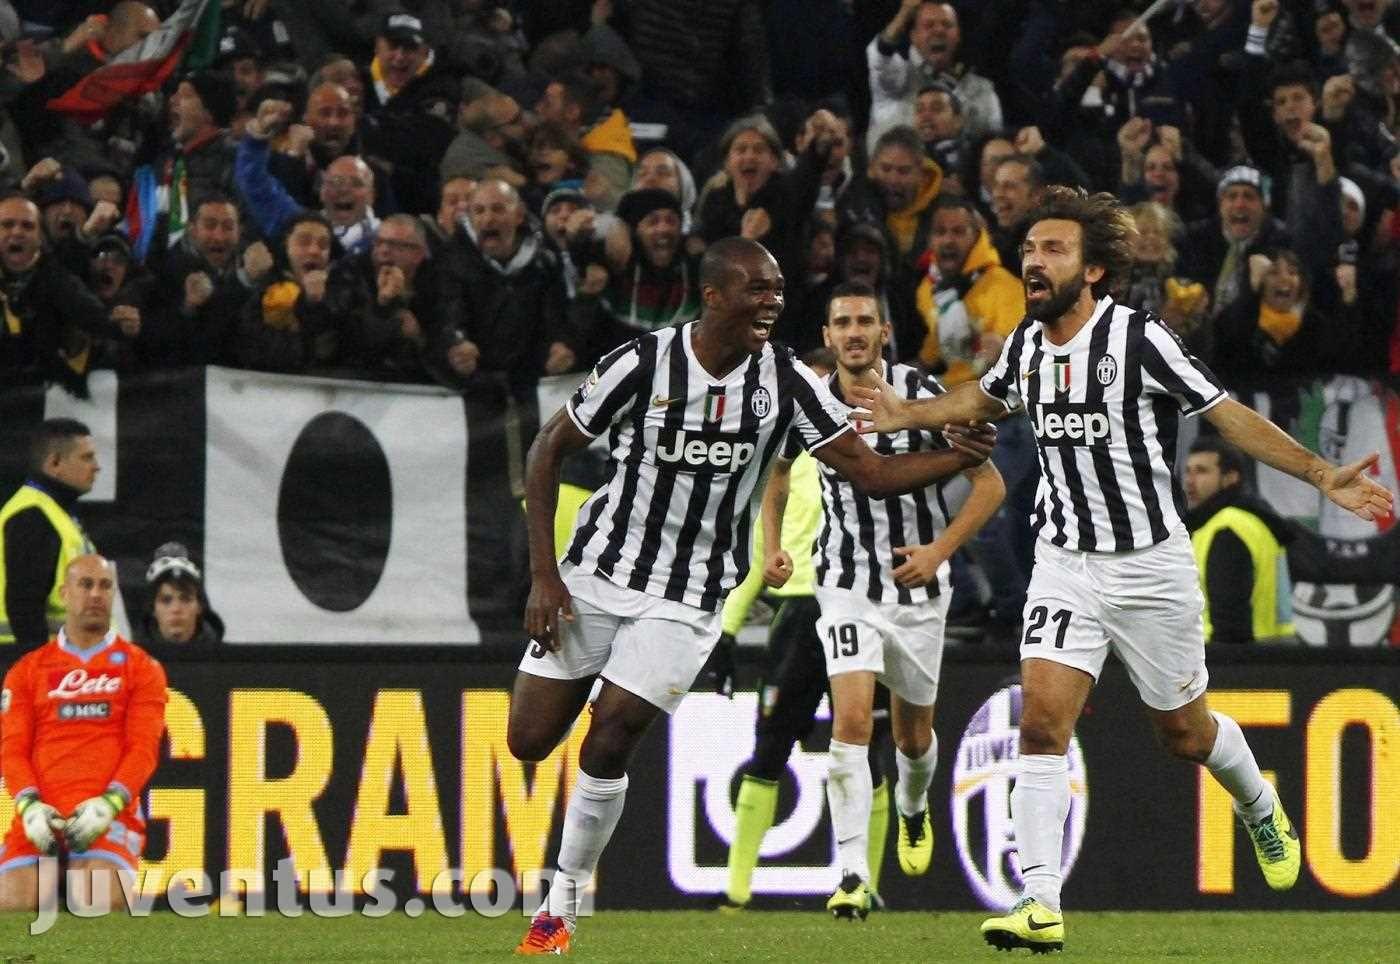 Juventus - Napoli 3-0 | Juventus, Calcio, Foto